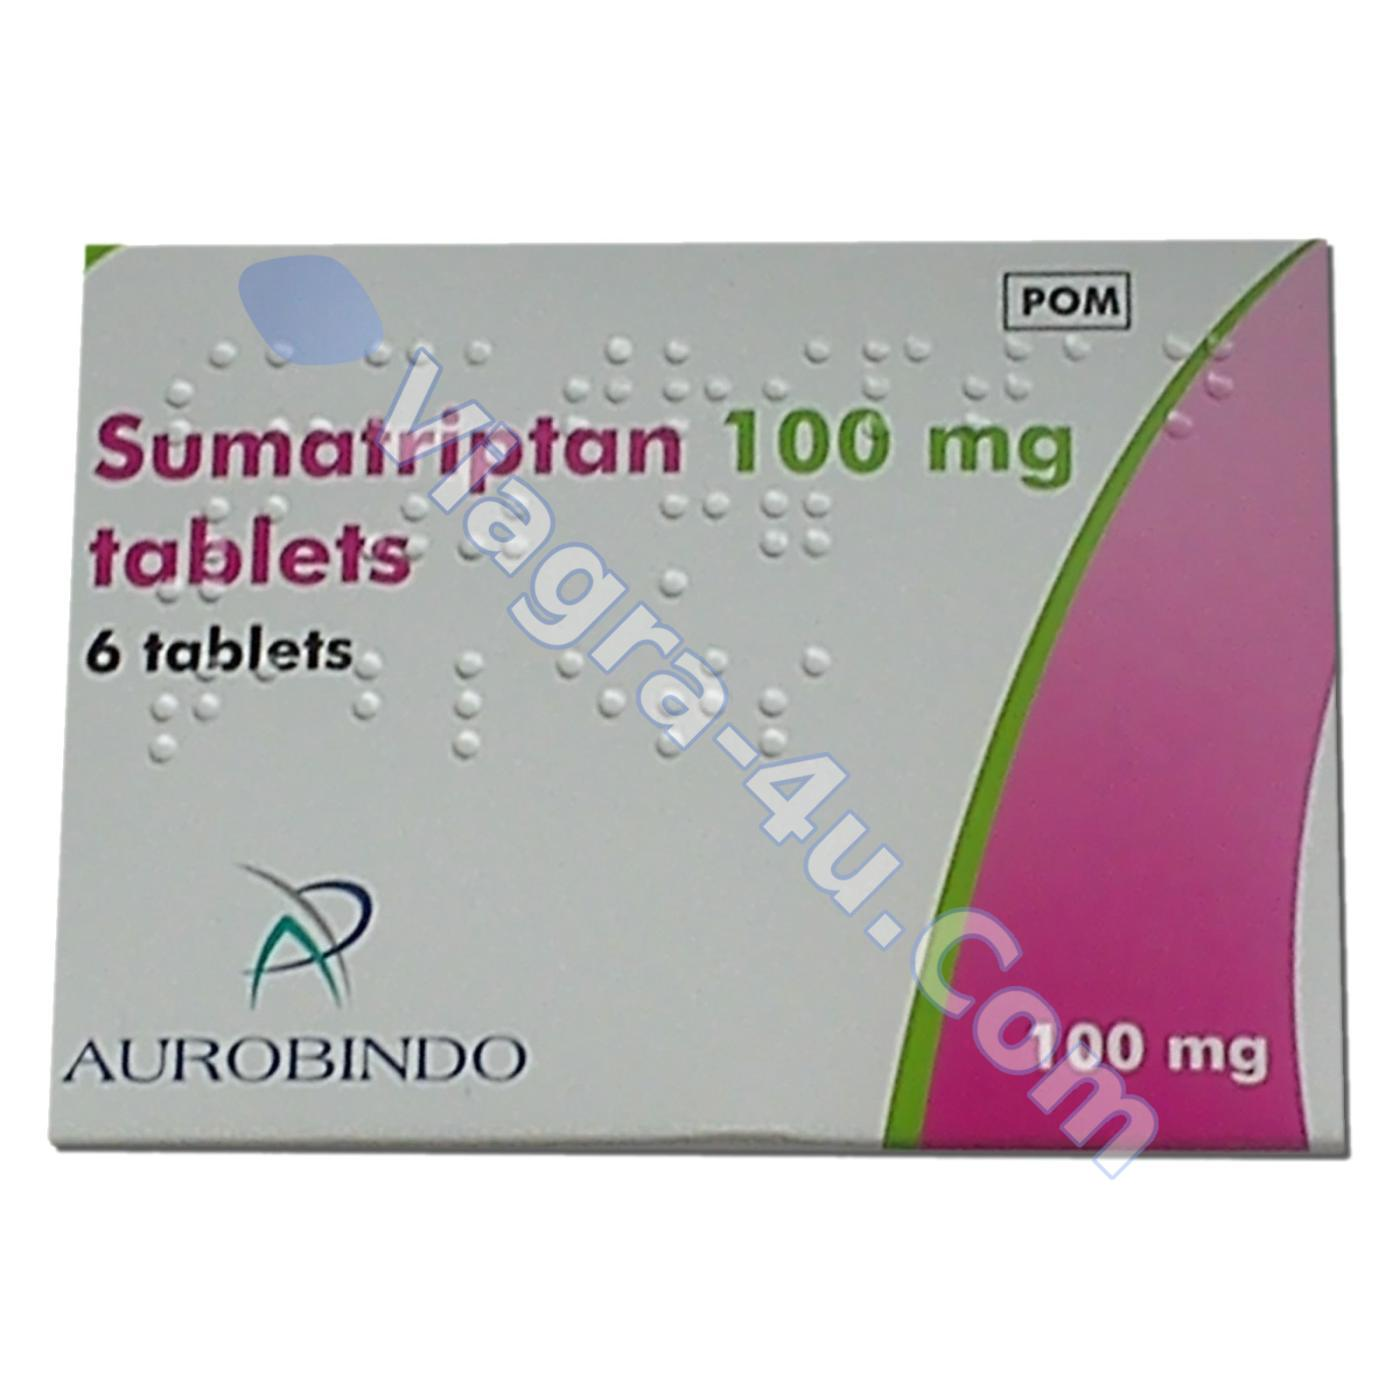 Buy Generic Imitrex (Sumatriptan) 100mg without prescription